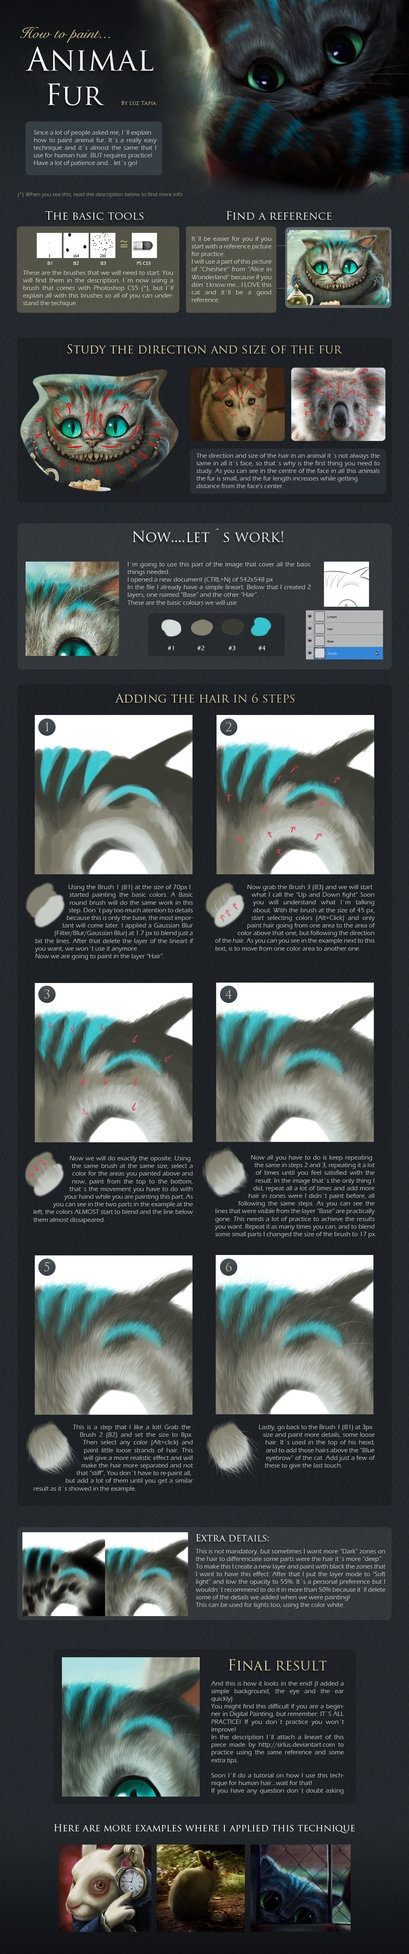 [TUT] How to paint animal fur by =LuzTapia on deviantART